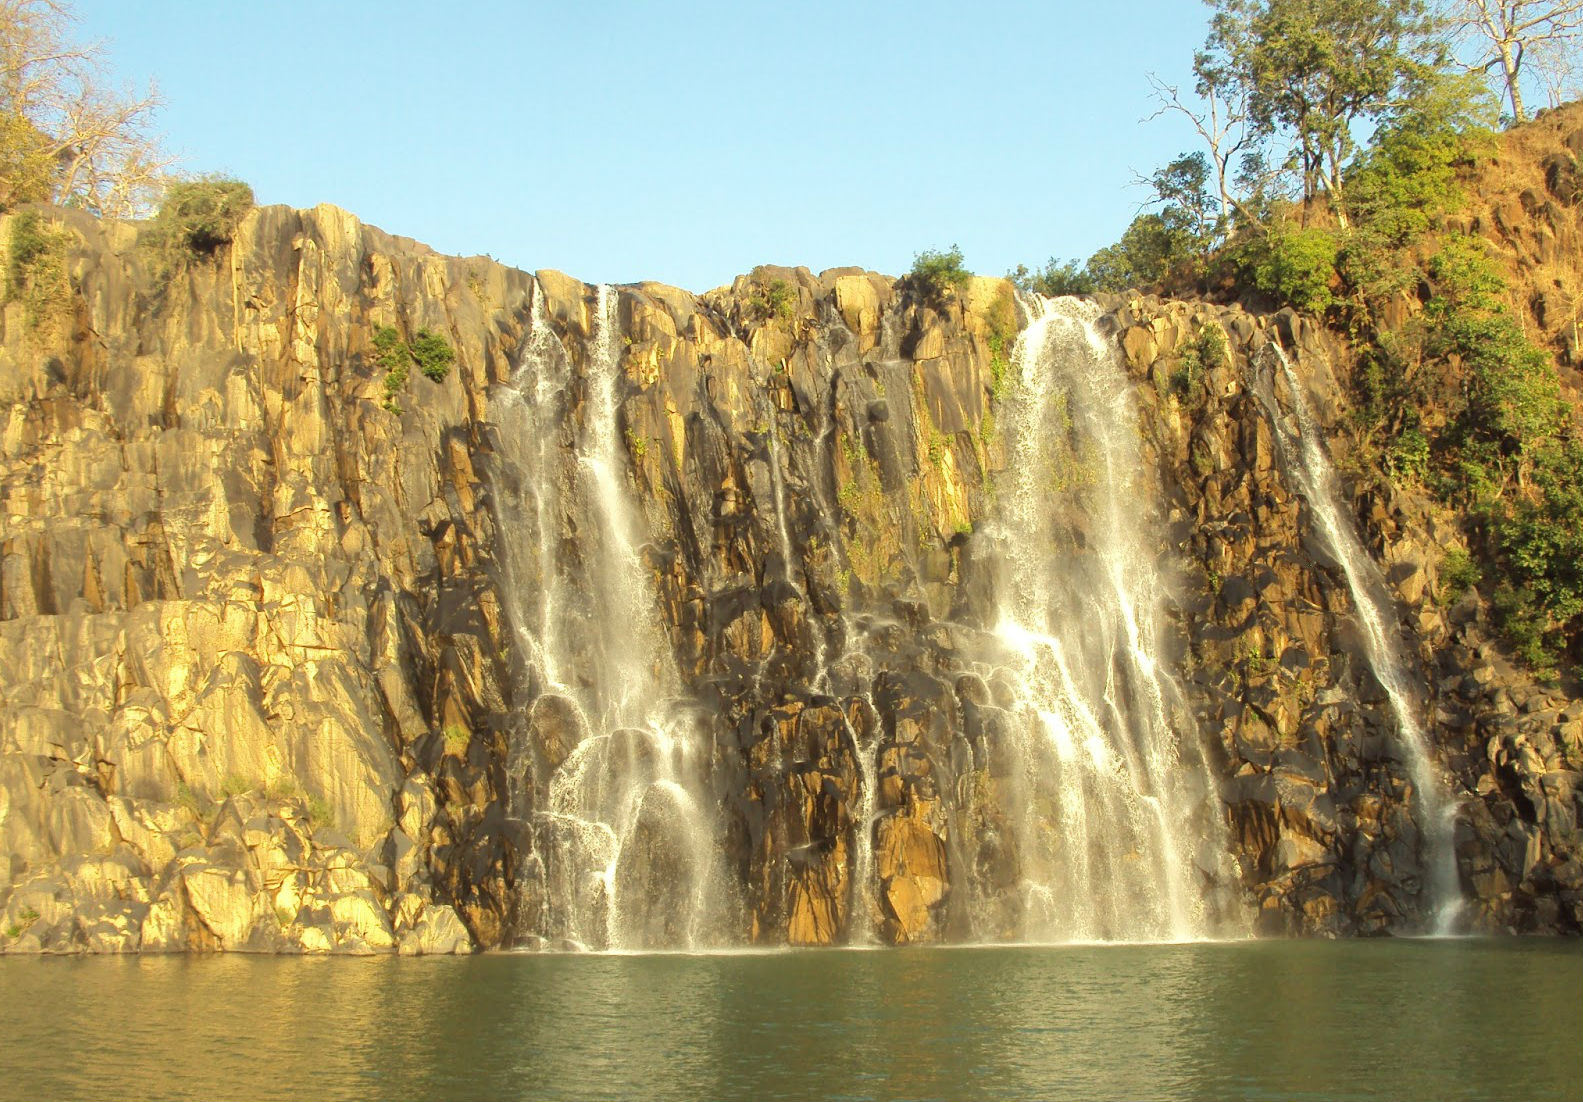 Baikunthpur Image